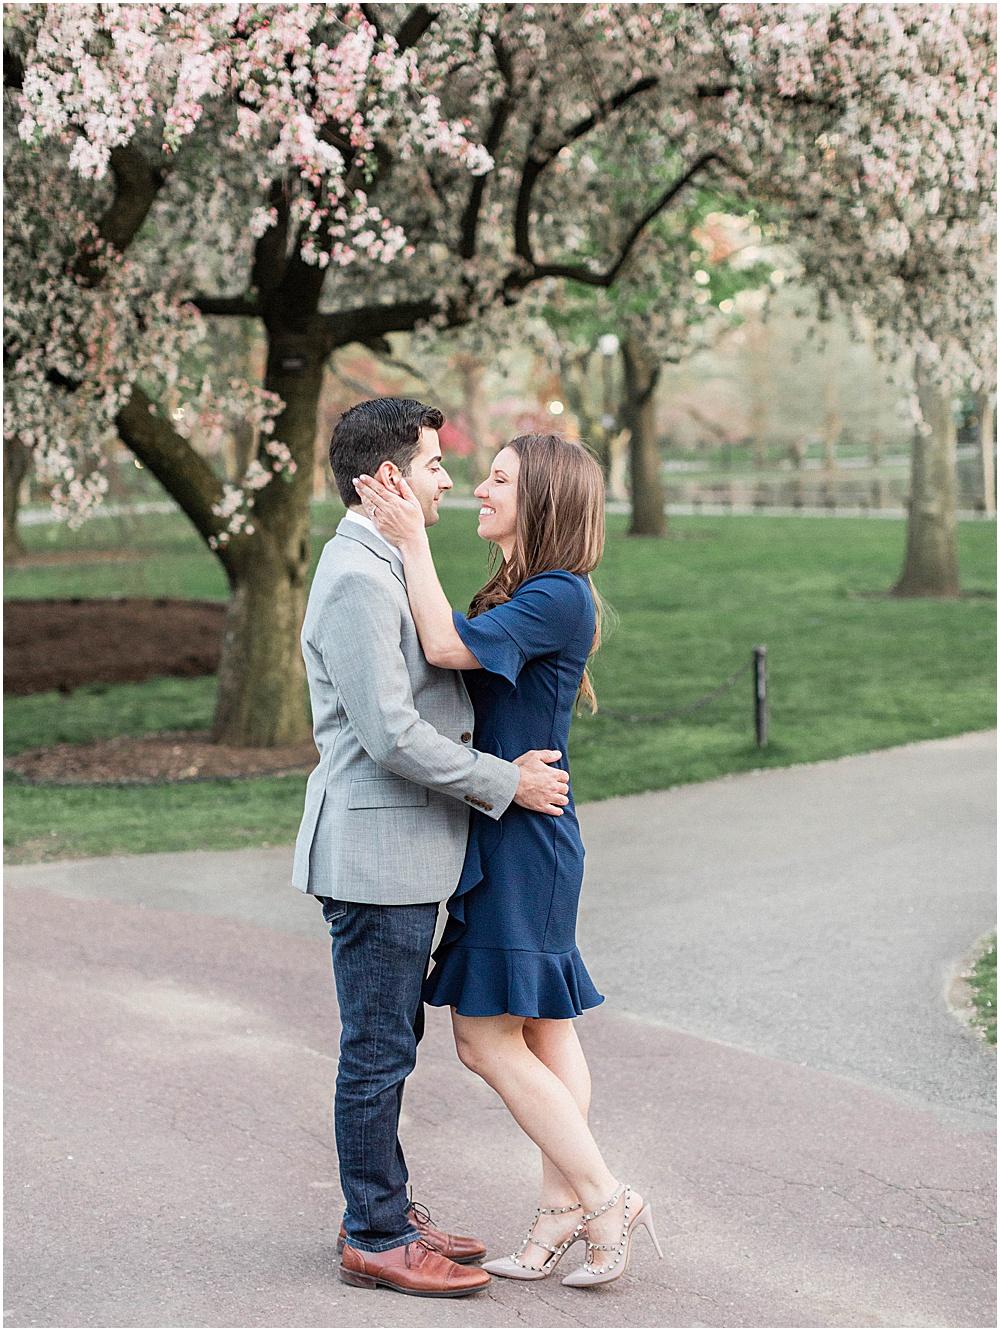 boston_common_cherry_blossoms_spring_engagement_session_boston_wedding_photographer_meredith_jane_photography_photo_0188.jpg